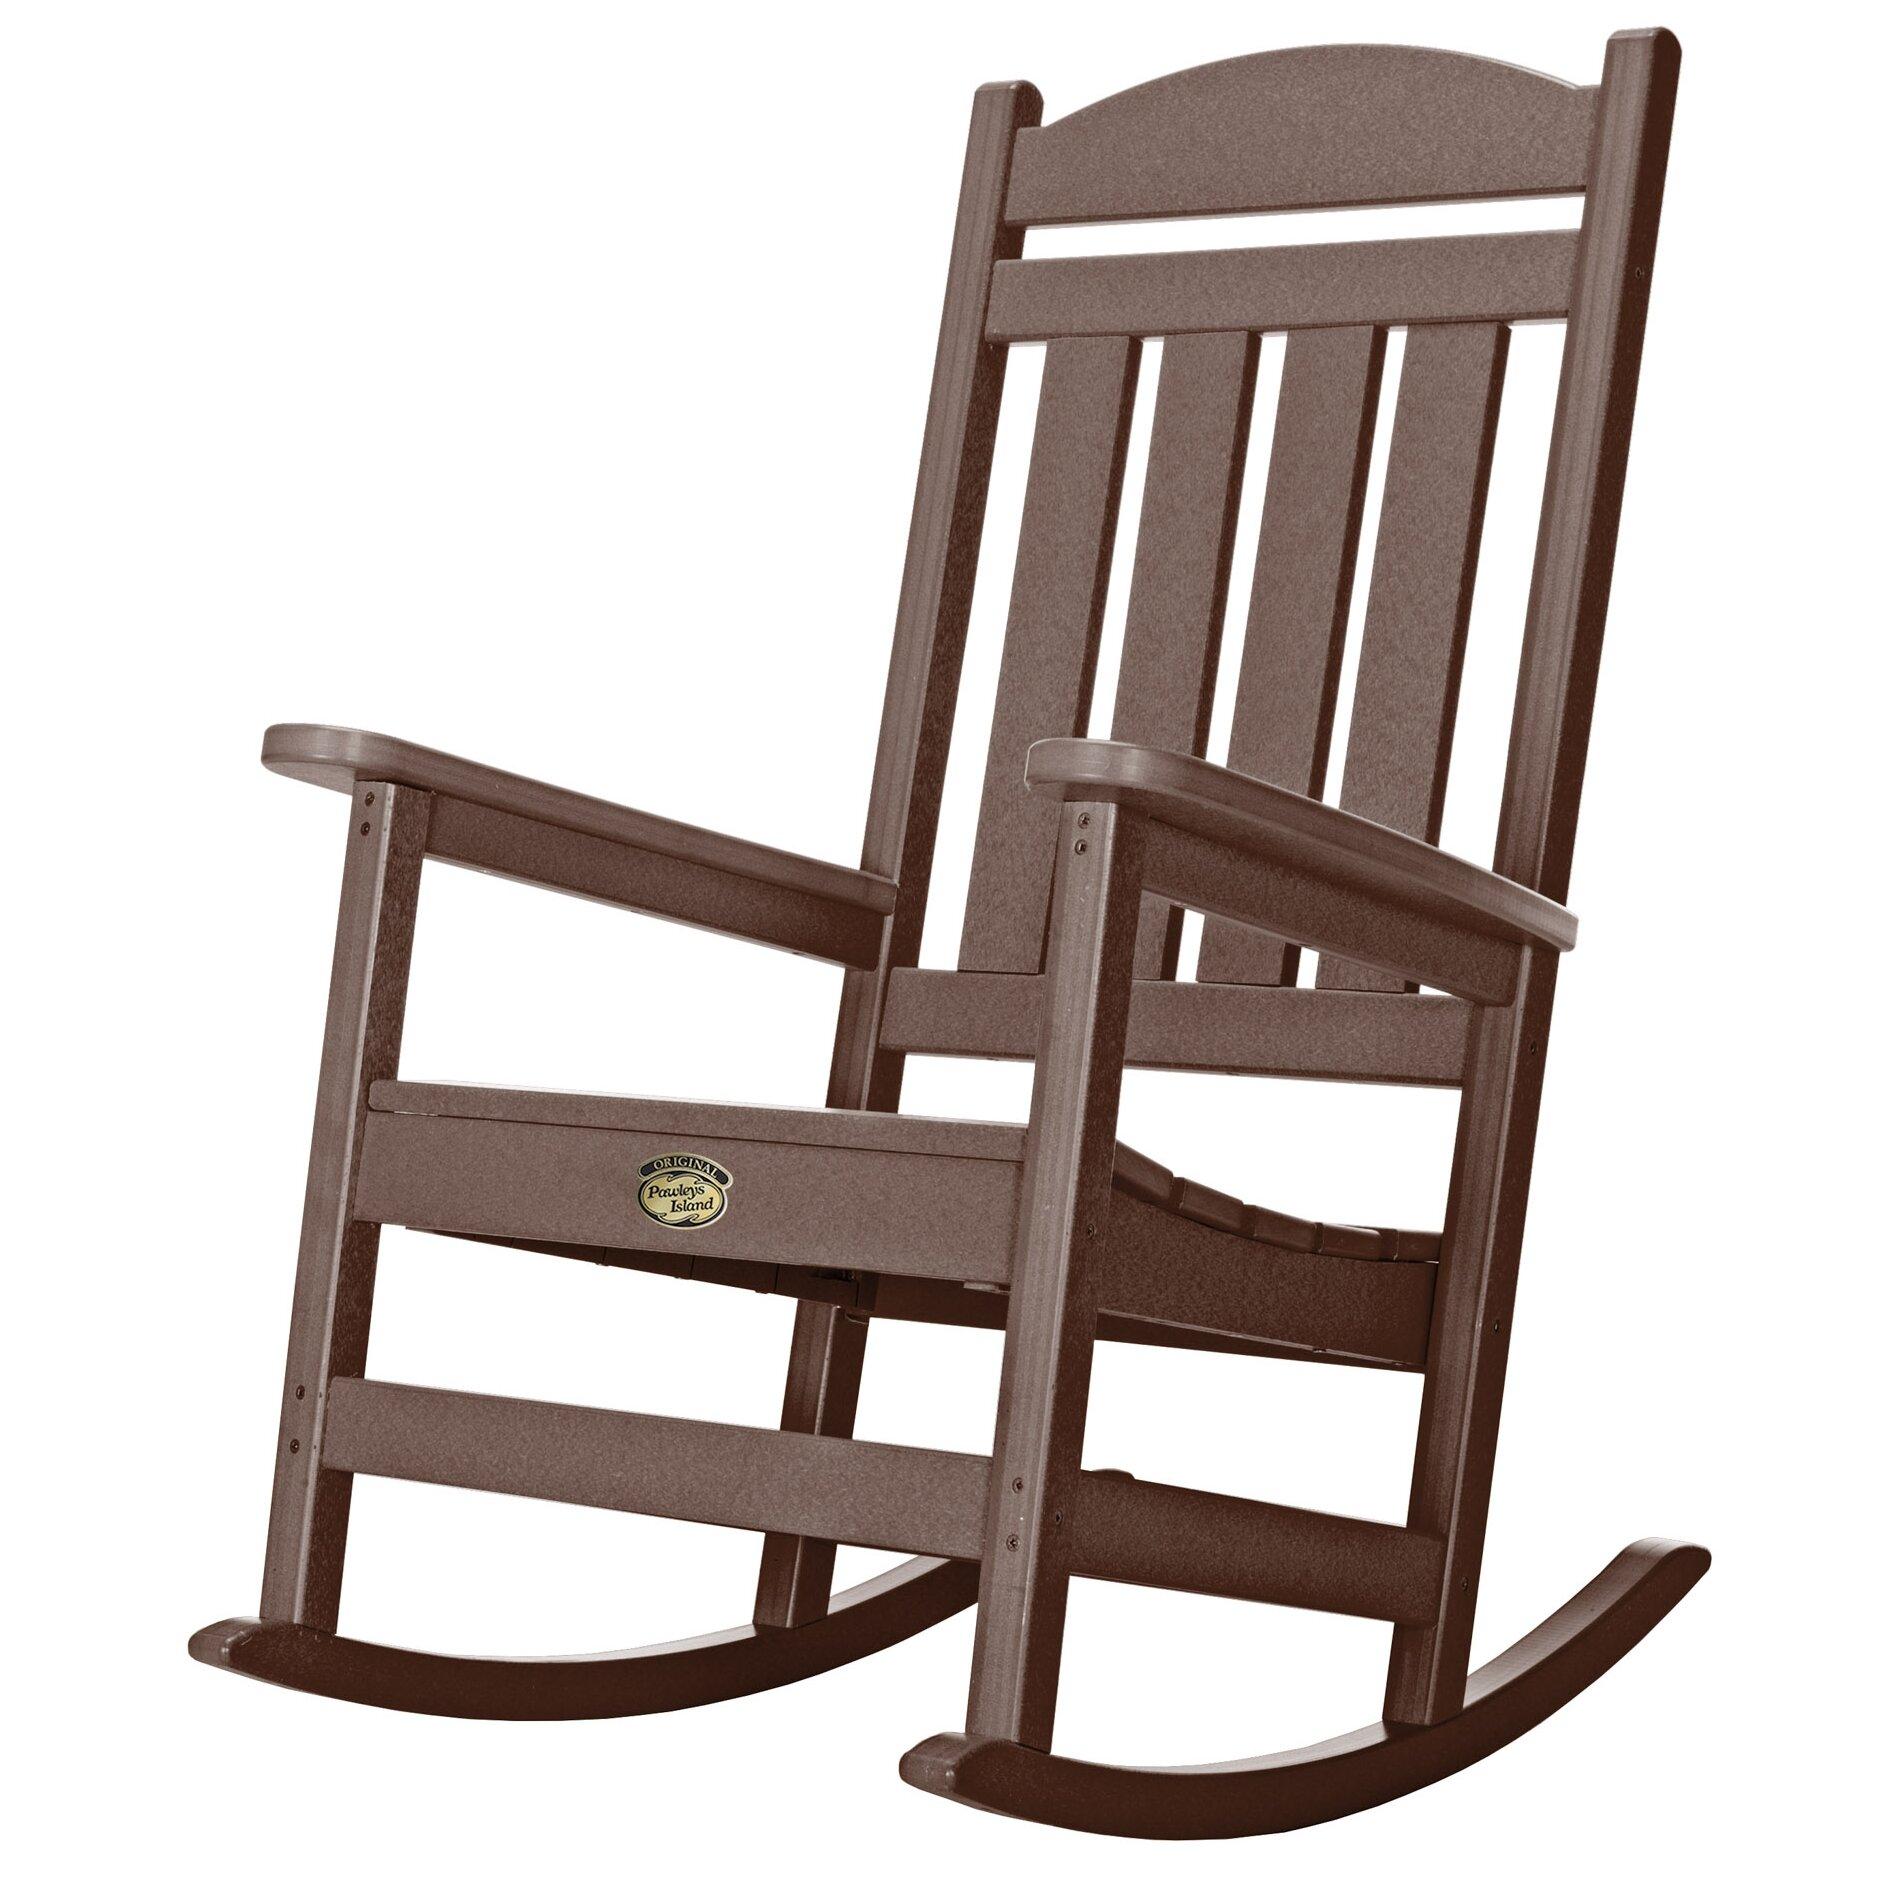 Pawleys Island Pawleys Island Porch Rocking Chair. Pawleys Island Pawleys Island Porch Rocking Chair   Reviews   Wayfair